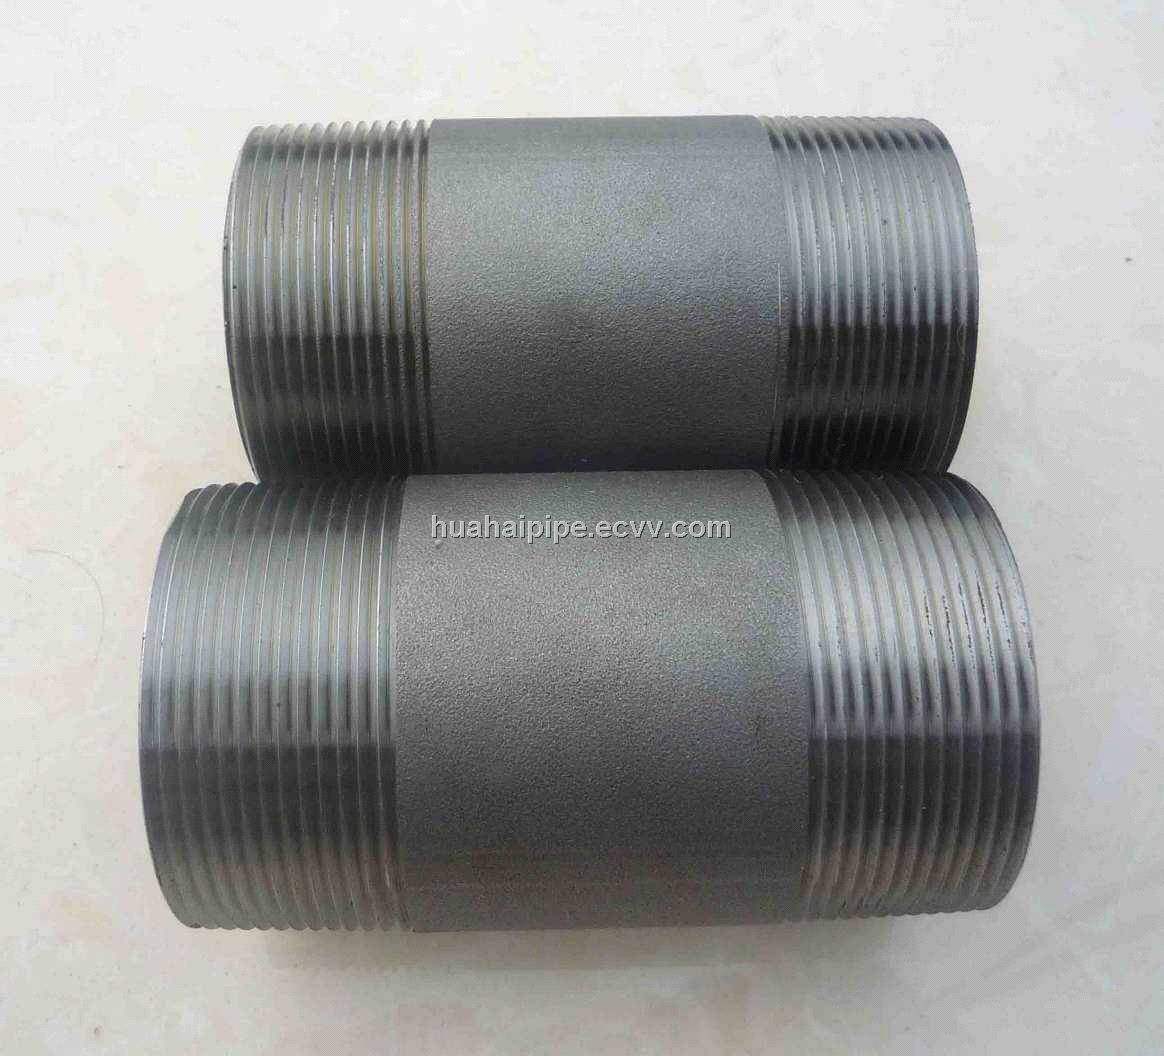 Carbon steel black sch pipe nipple npt purchasing